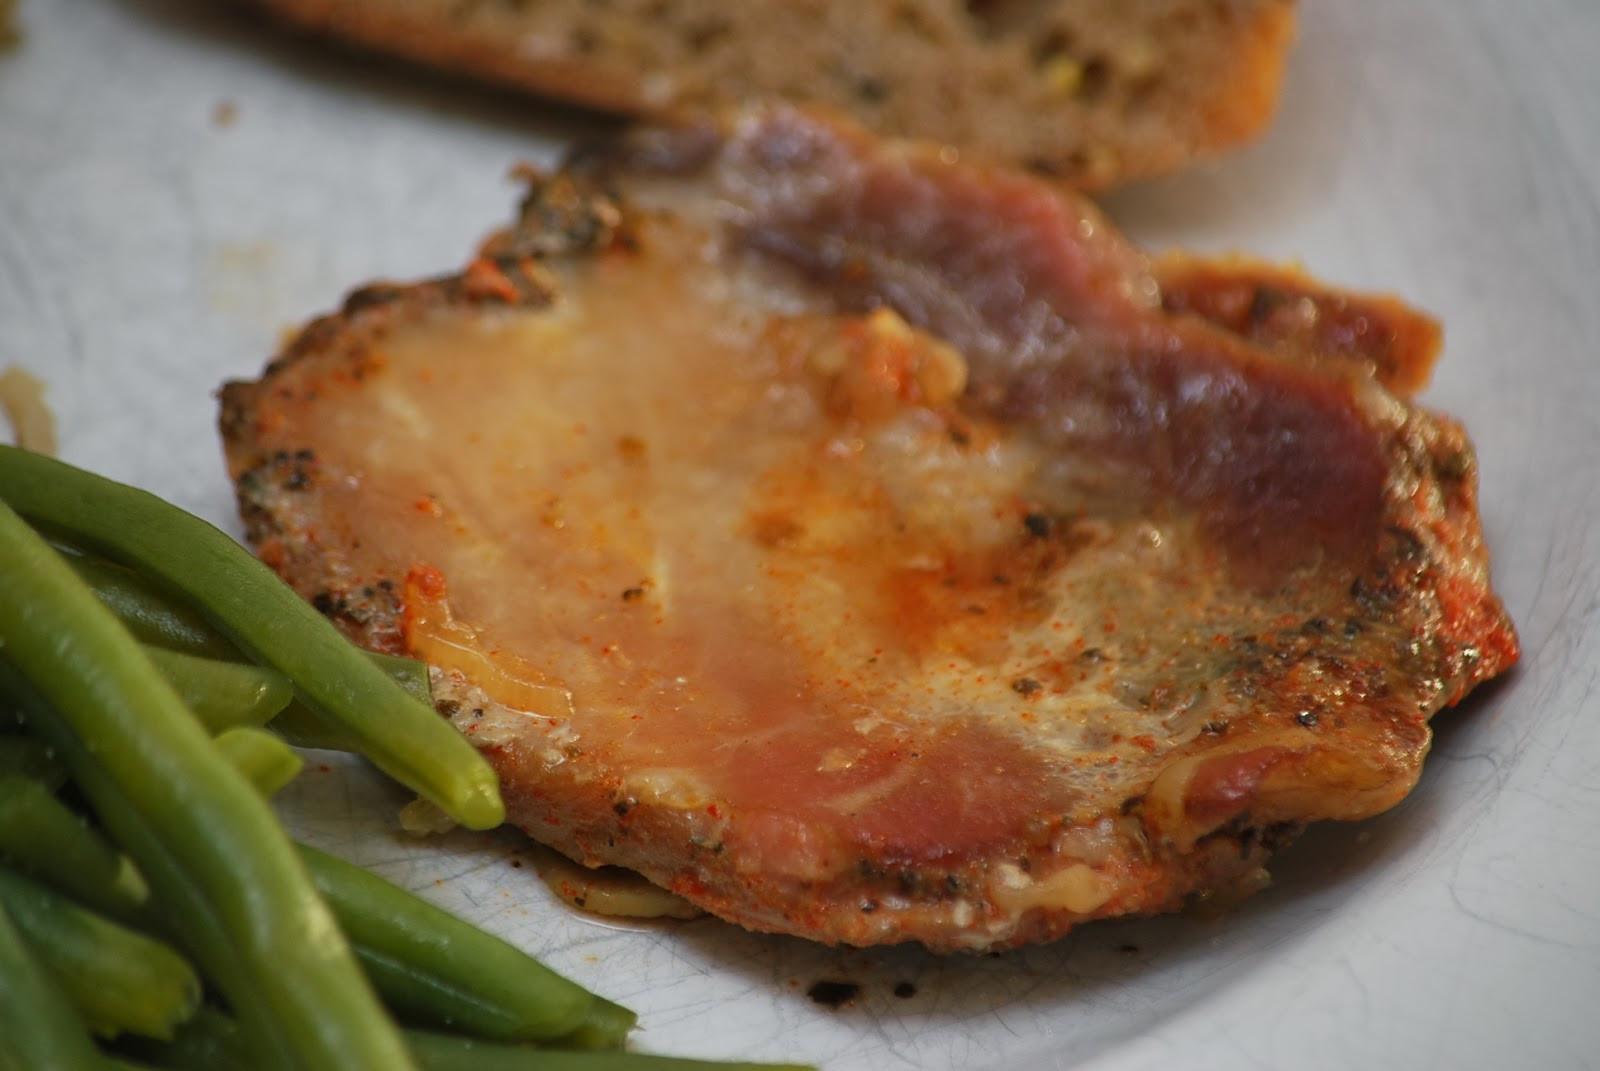 Pork Chops Recipes In Crock Pot  My story in recipes Crock Pot Pork Chops